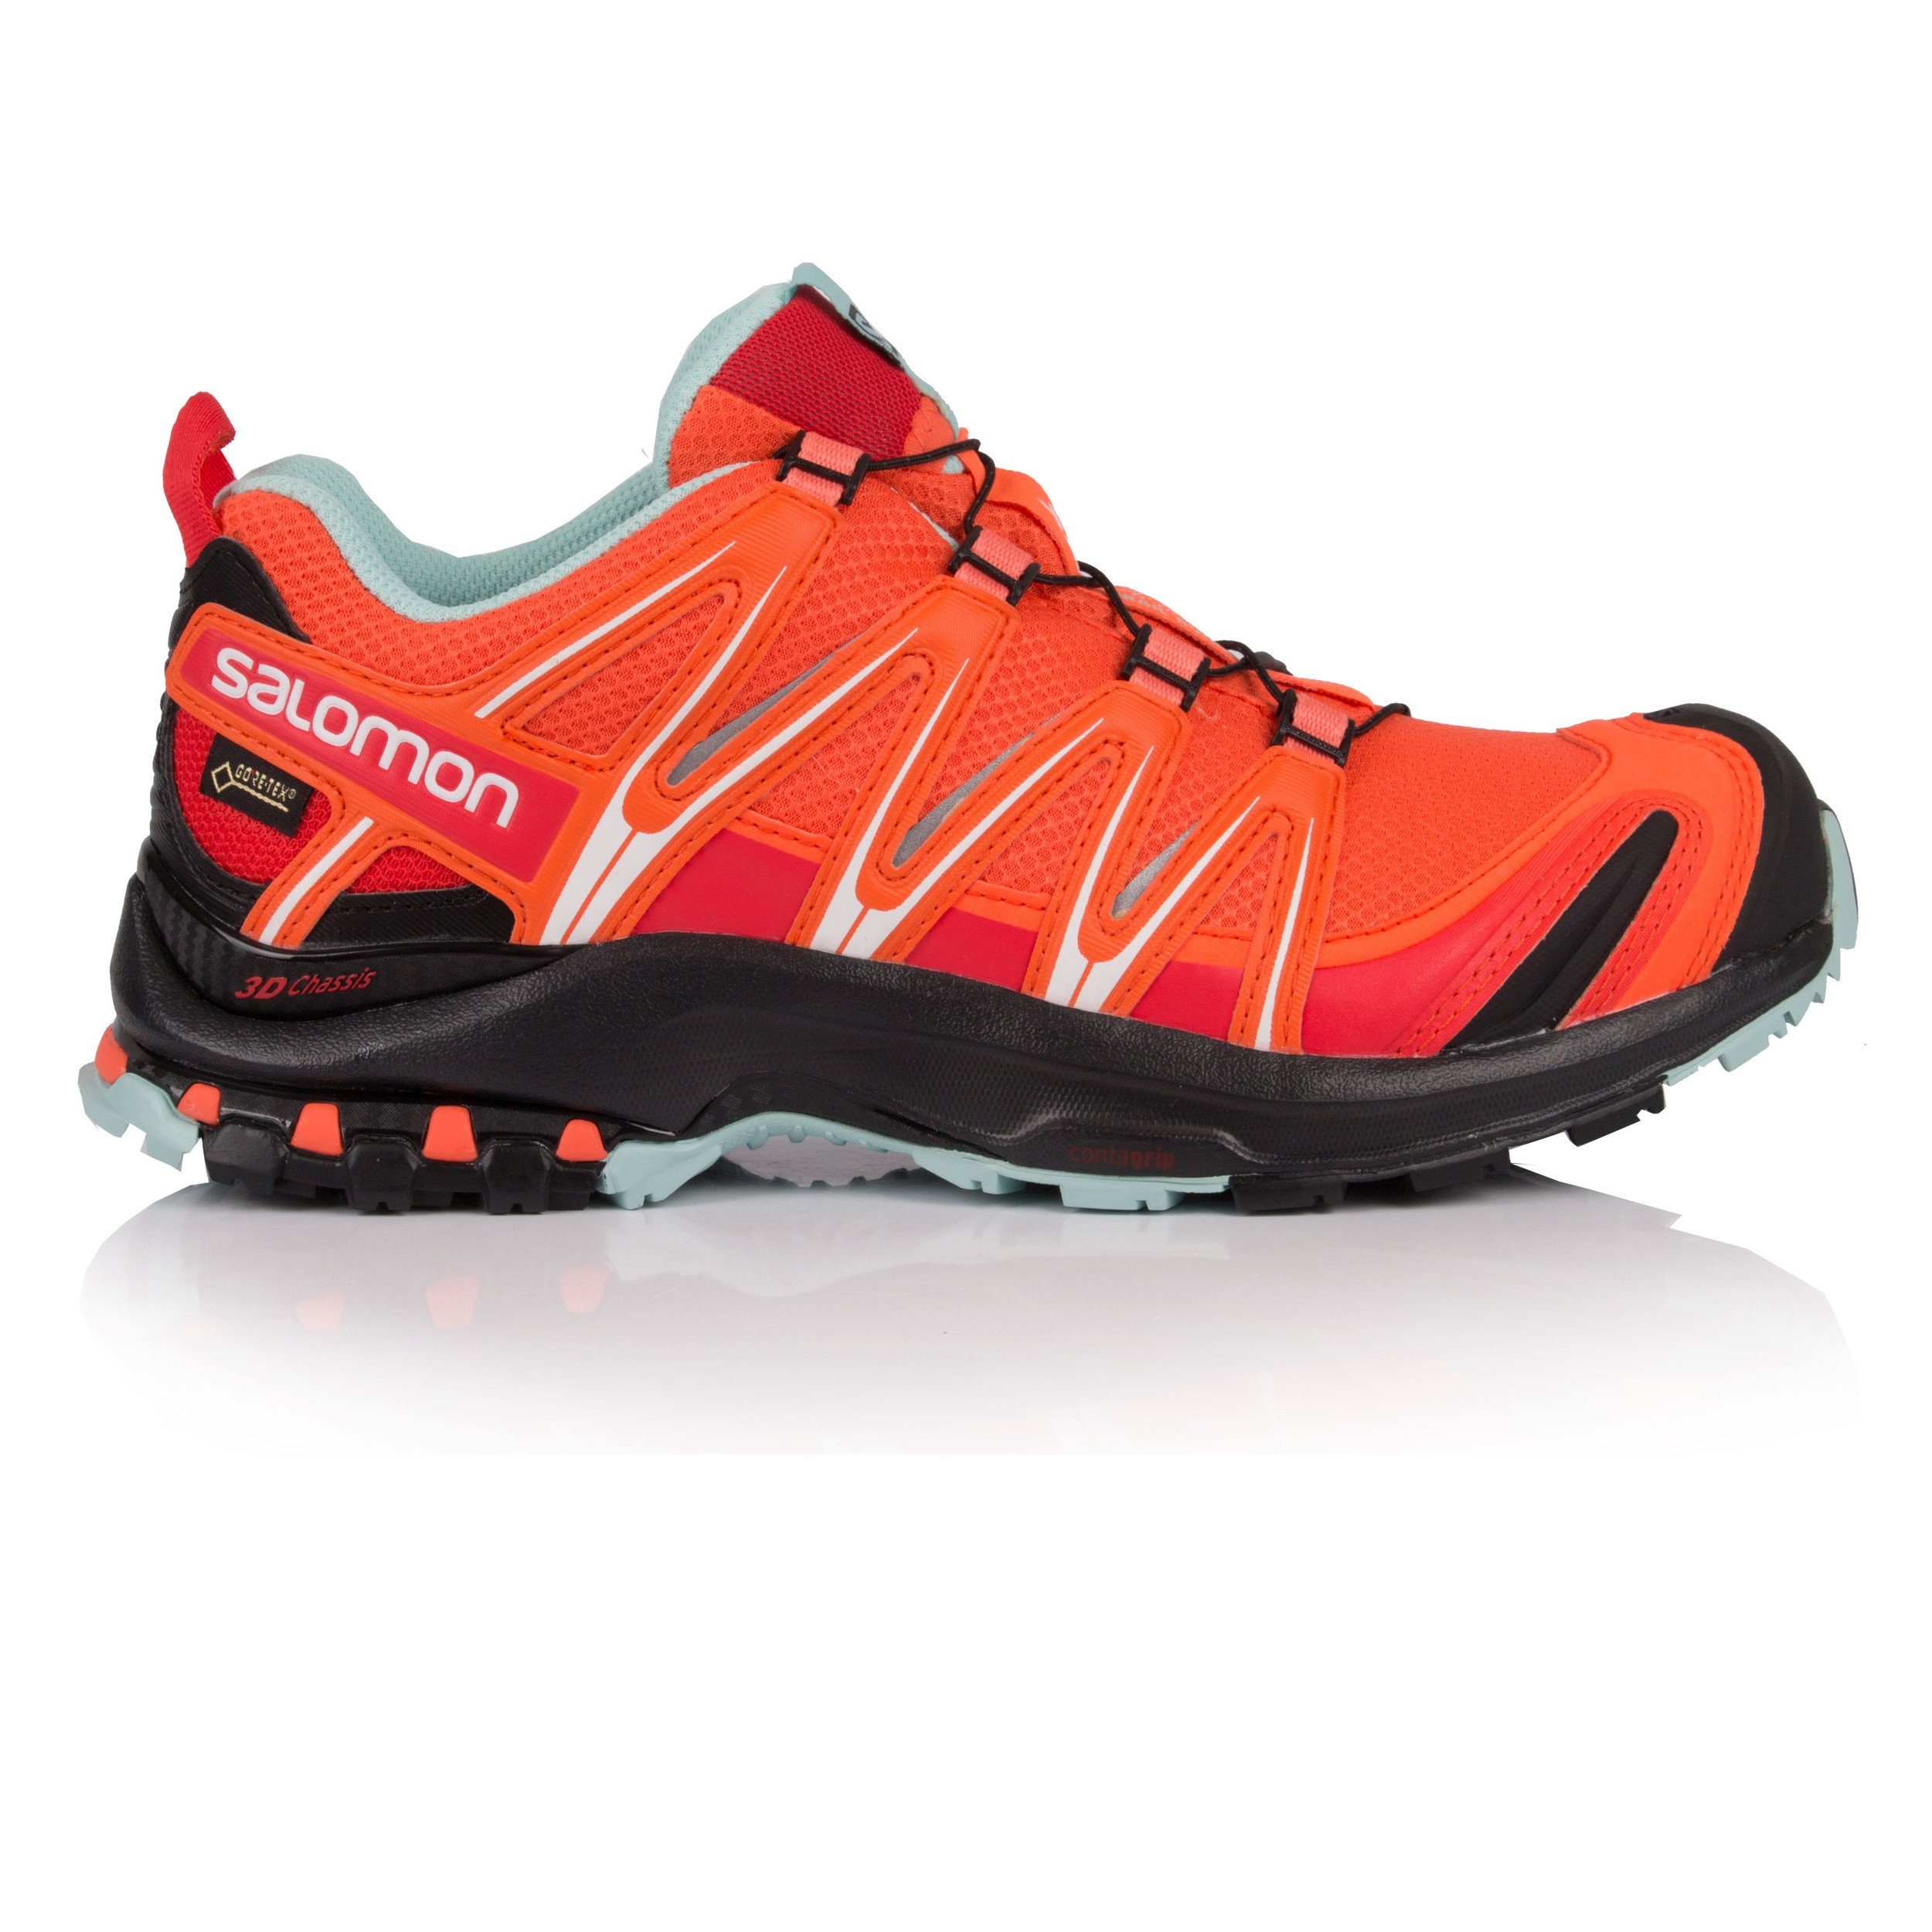 9960a2f83a30 Top Chaussures de running femme selon les notes Amazon.fr